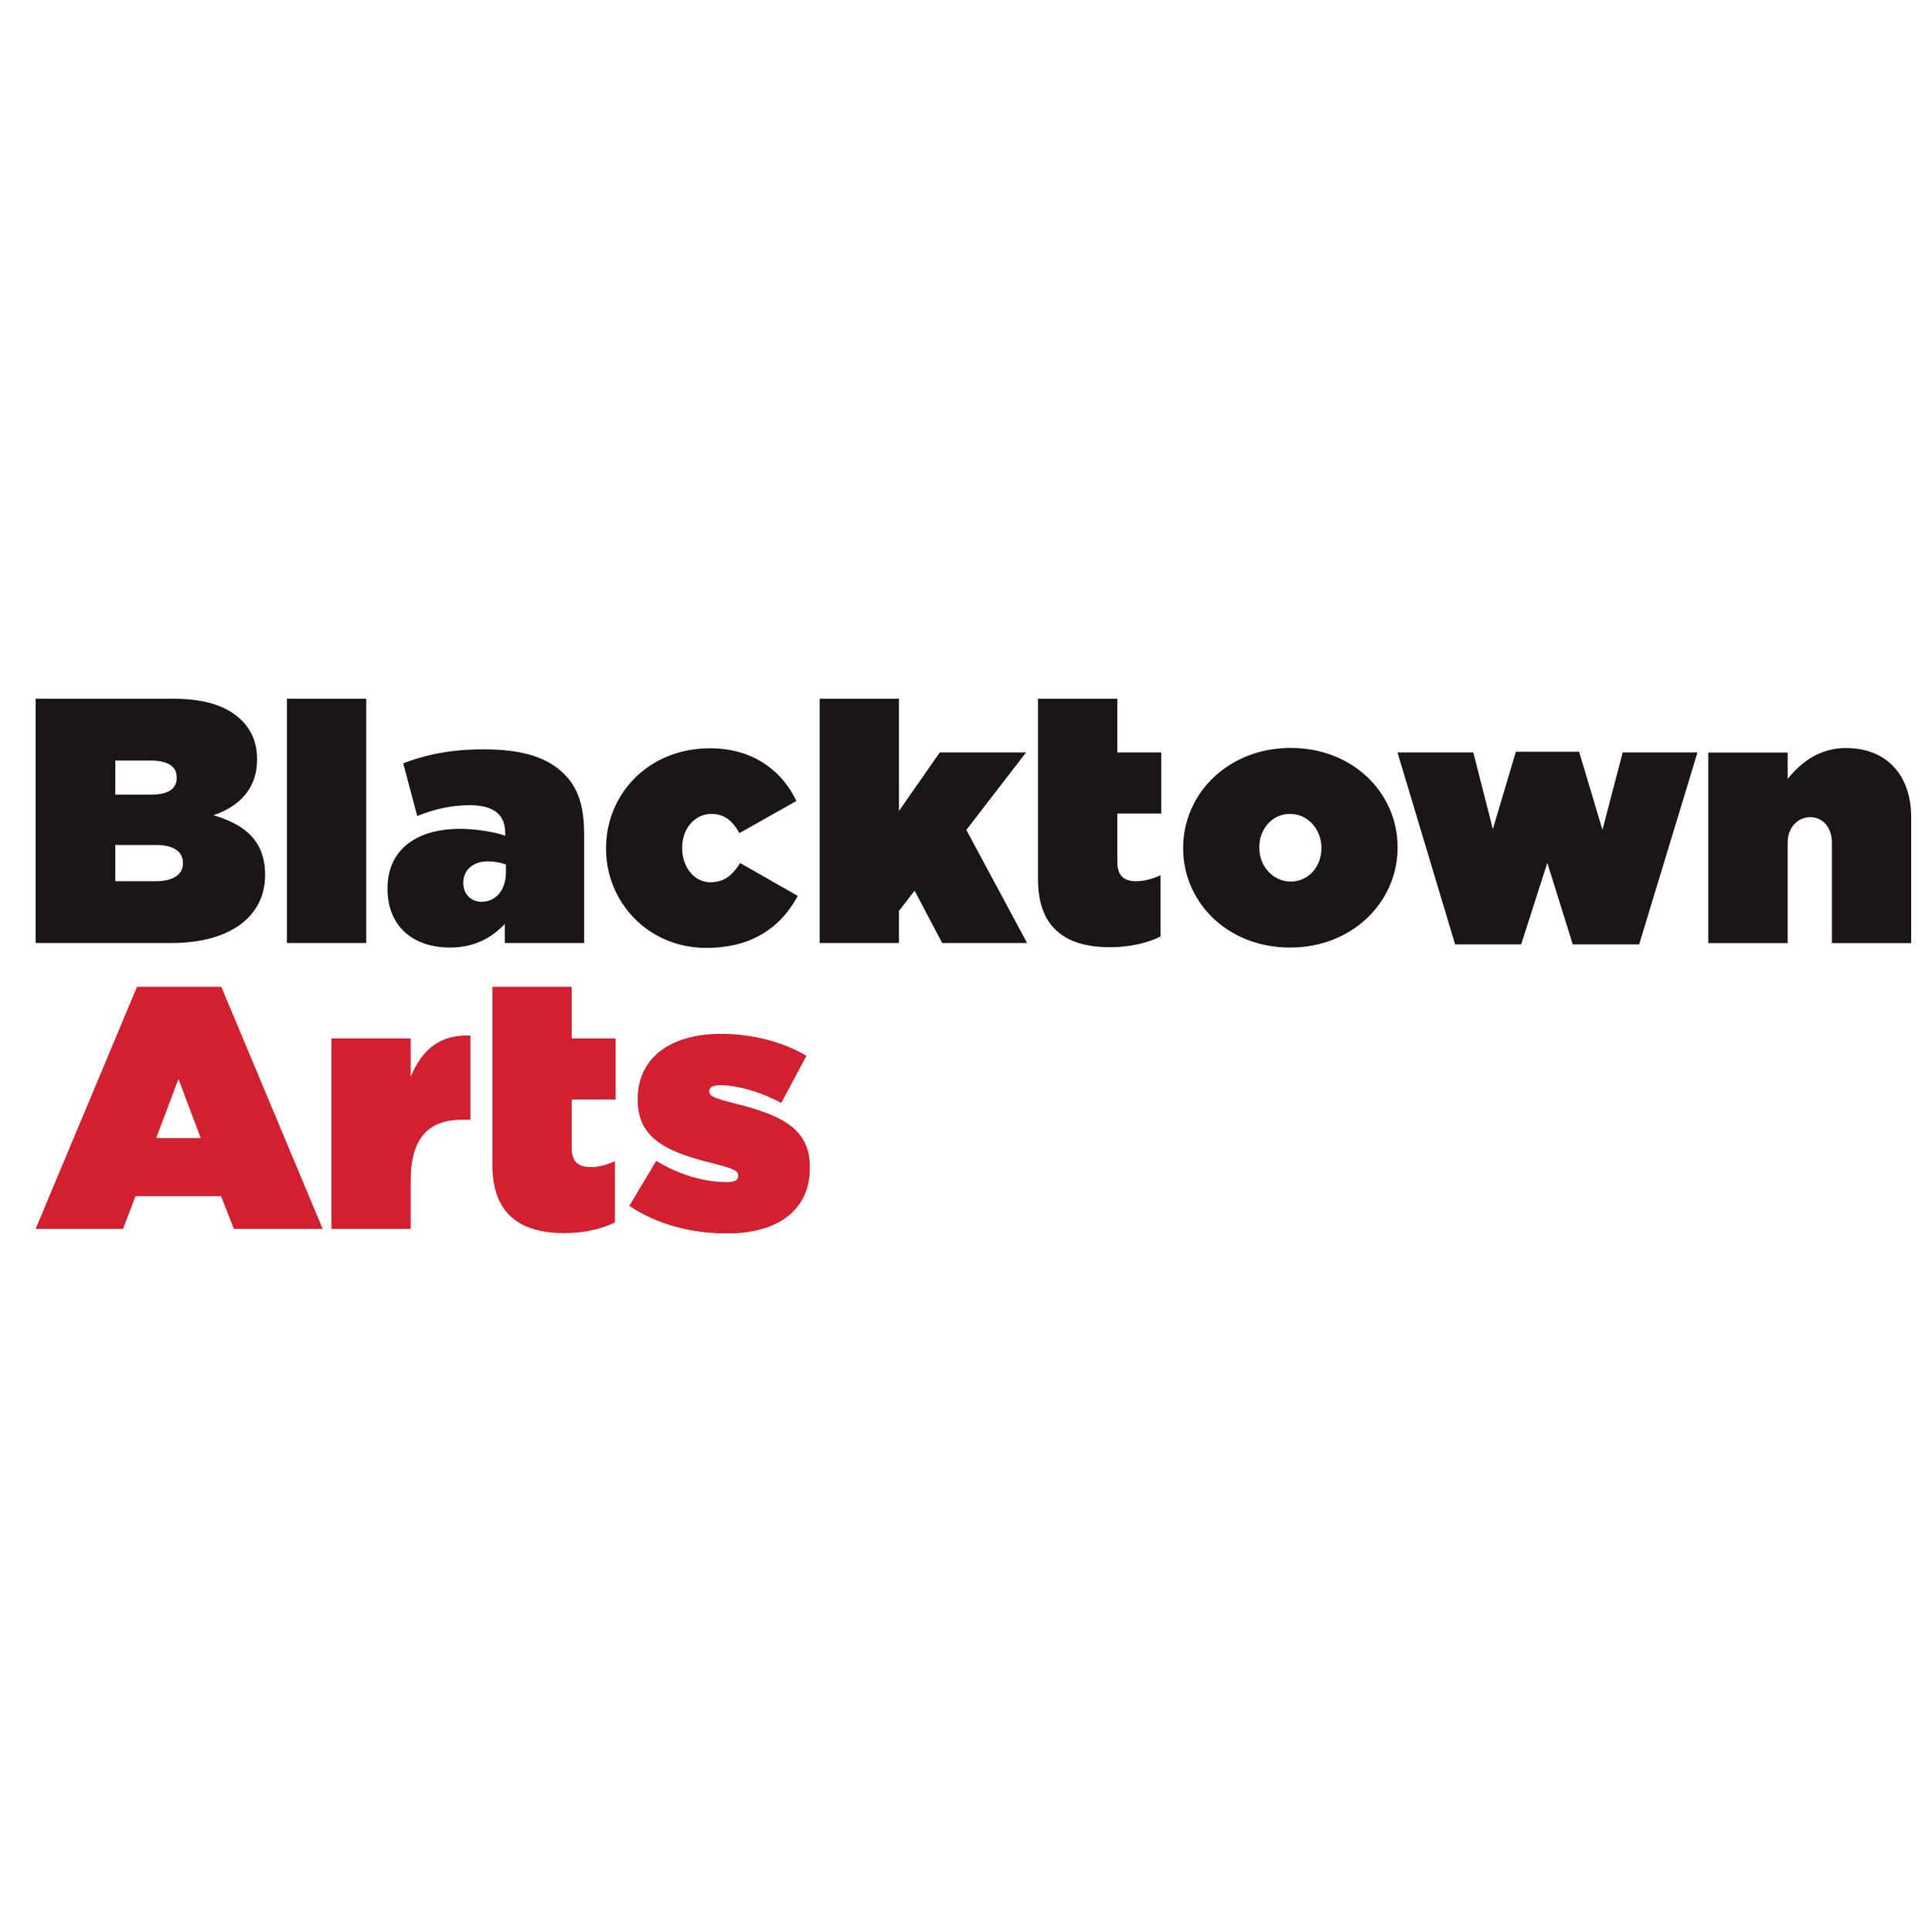 BA-logo-stack-CL.jpg